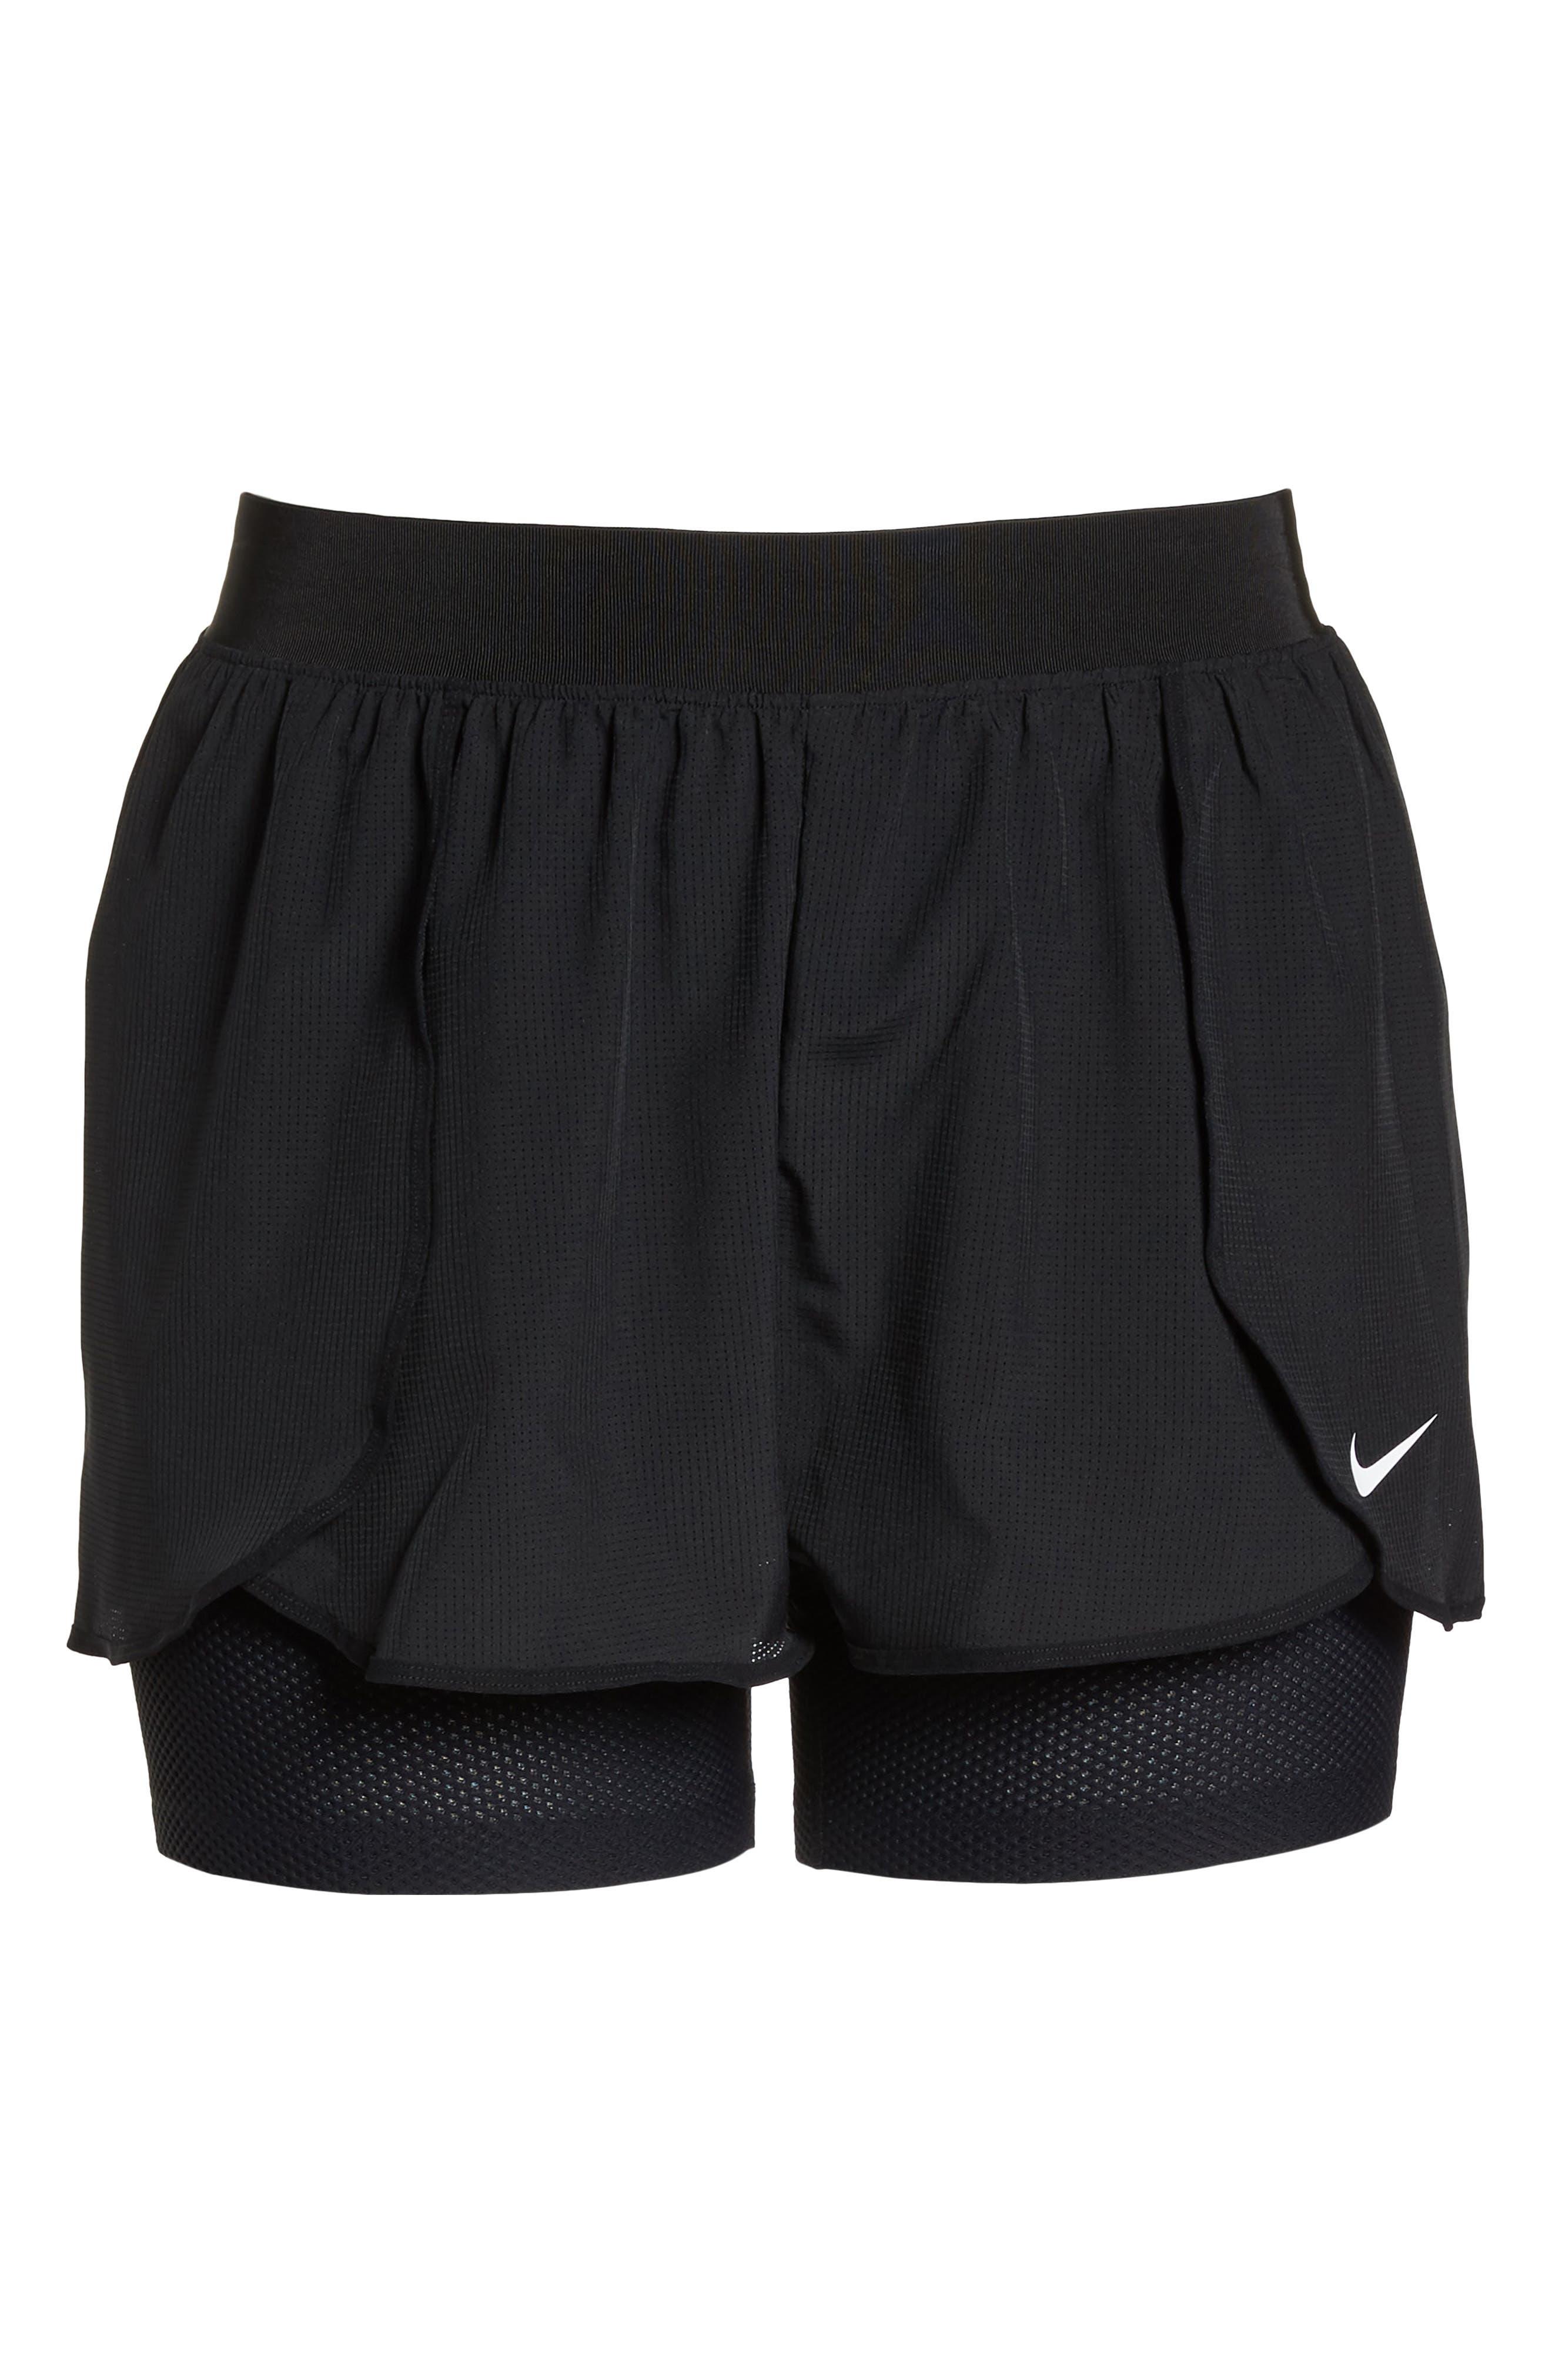 NIKE,                             Flex Bliss 2-in-1 Training Shorts,                             Alternate thumbnail 6, color,                             010